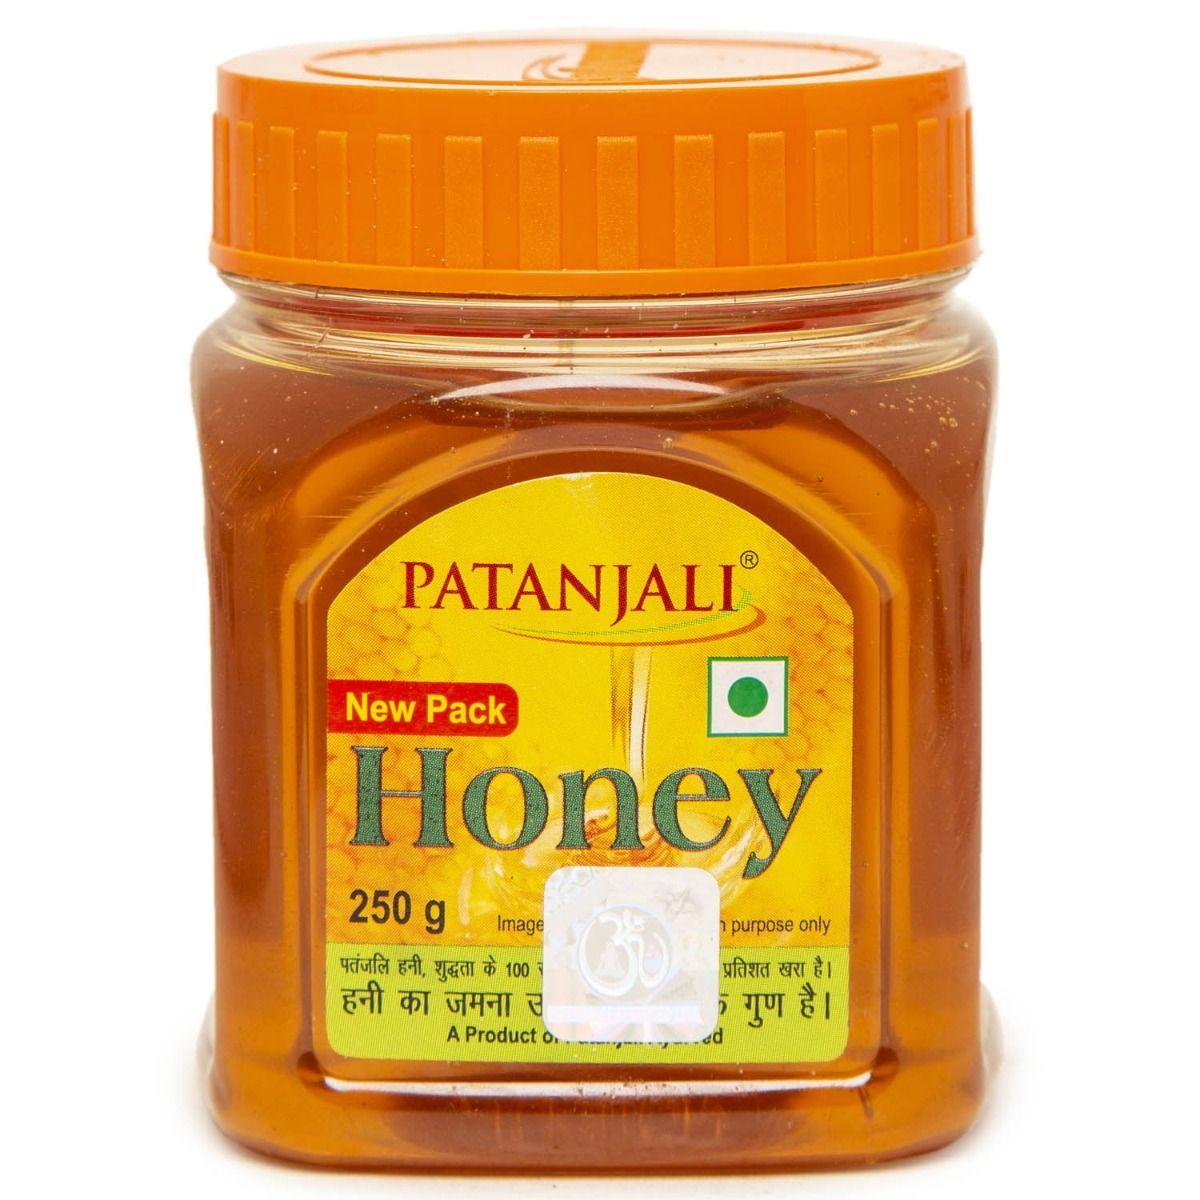 Patanjali Honey, 250 gm, Pack of 1